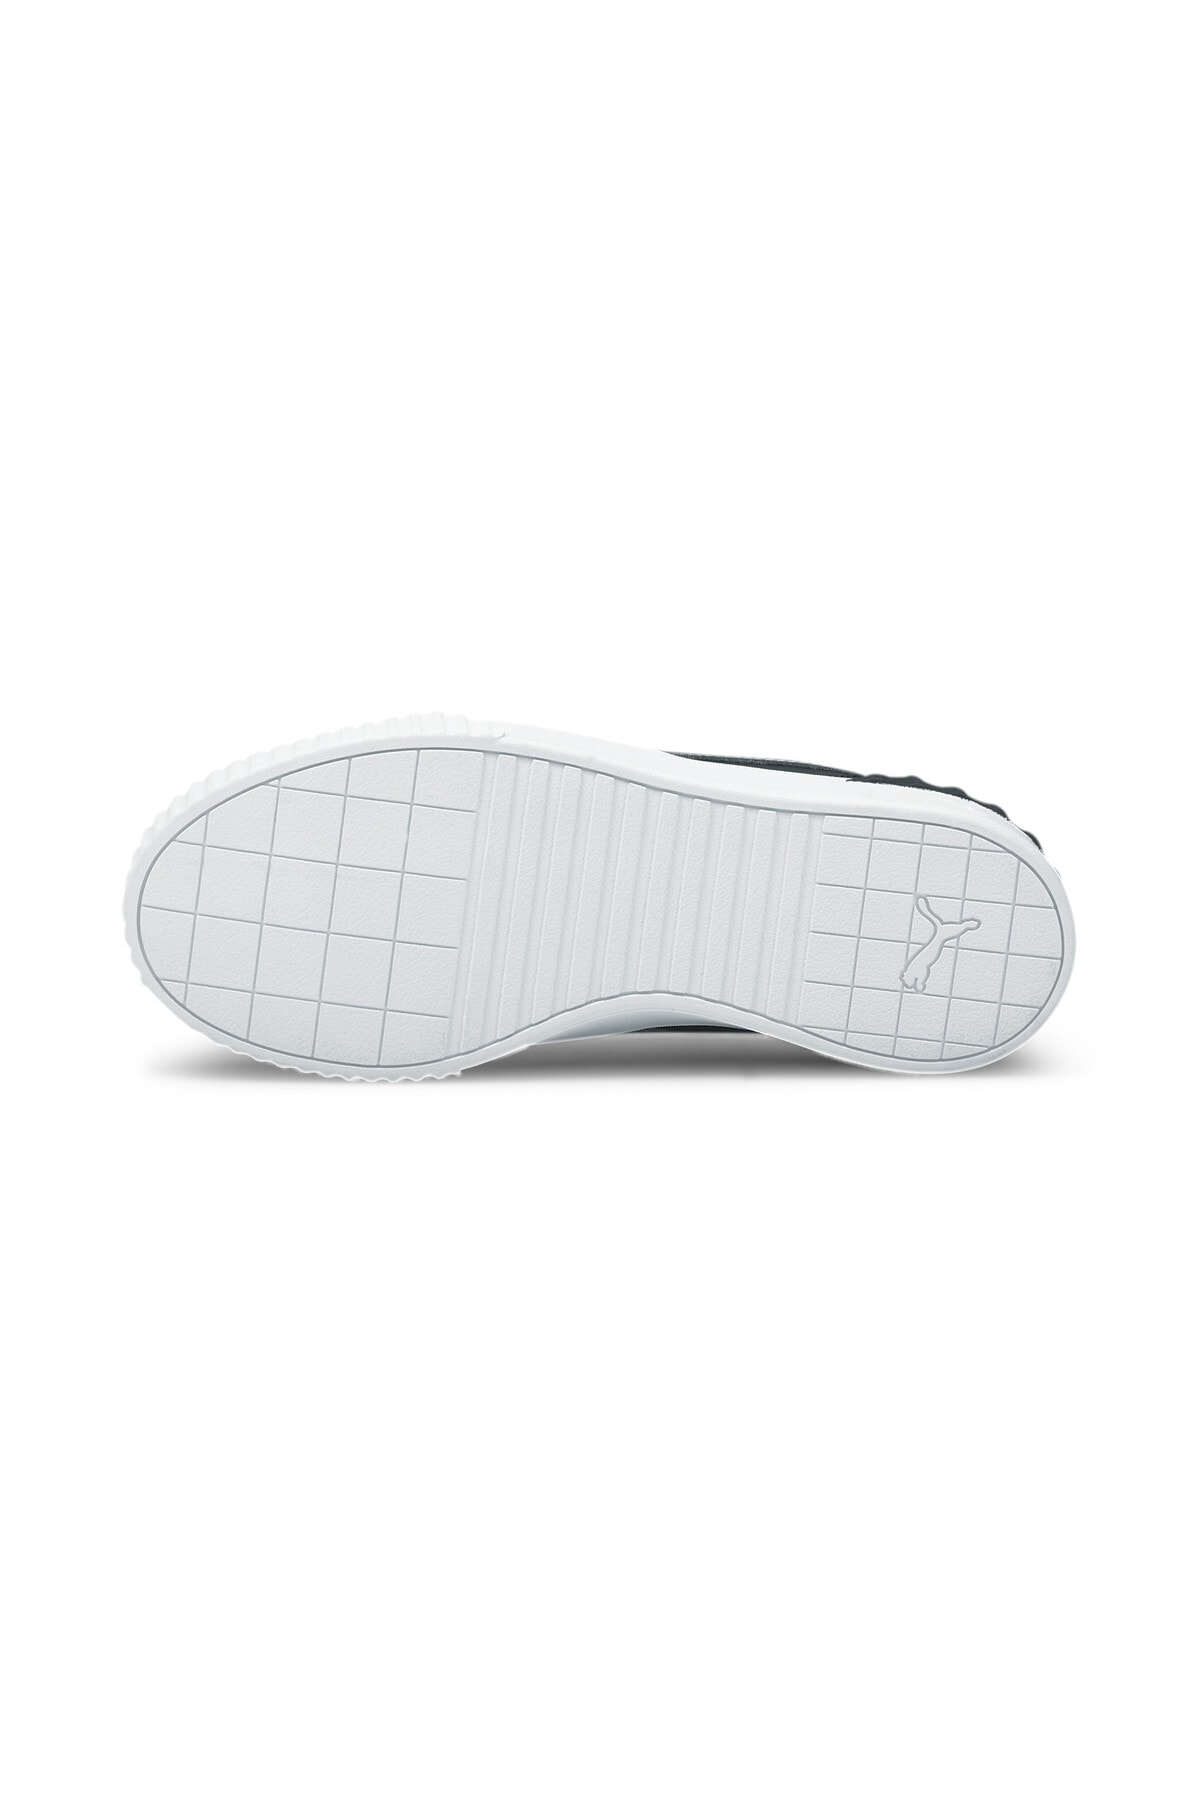 Puma Kadın Sneaker - CARINA LIFT METALLIC - 37599502 3